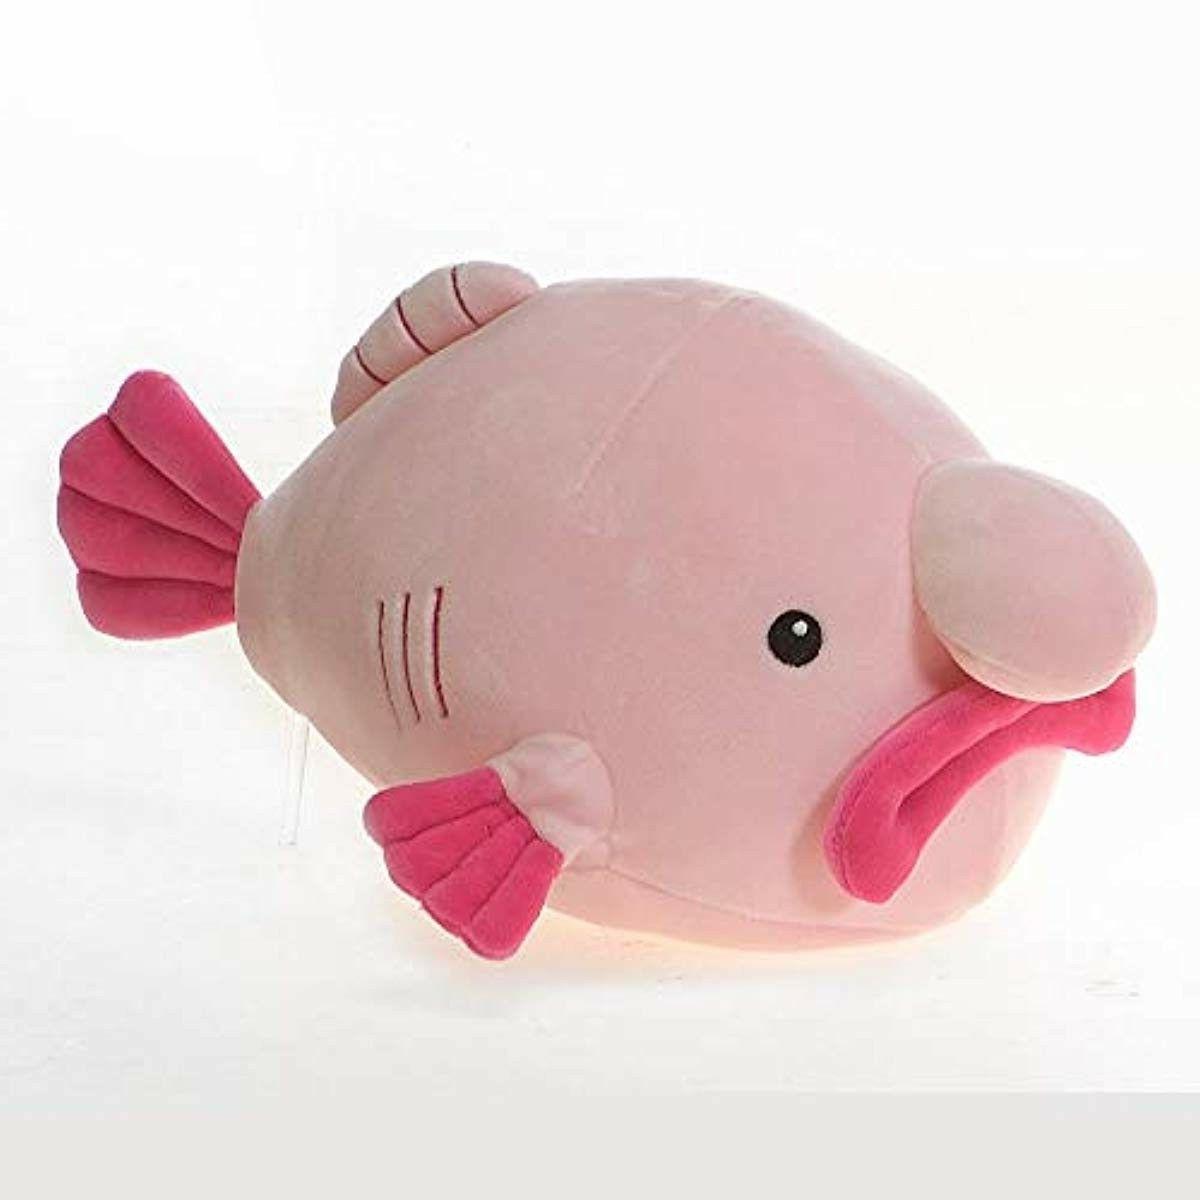 Fiesta Toys Snugglies Pink Blob Fish Stuffed Animal Toy